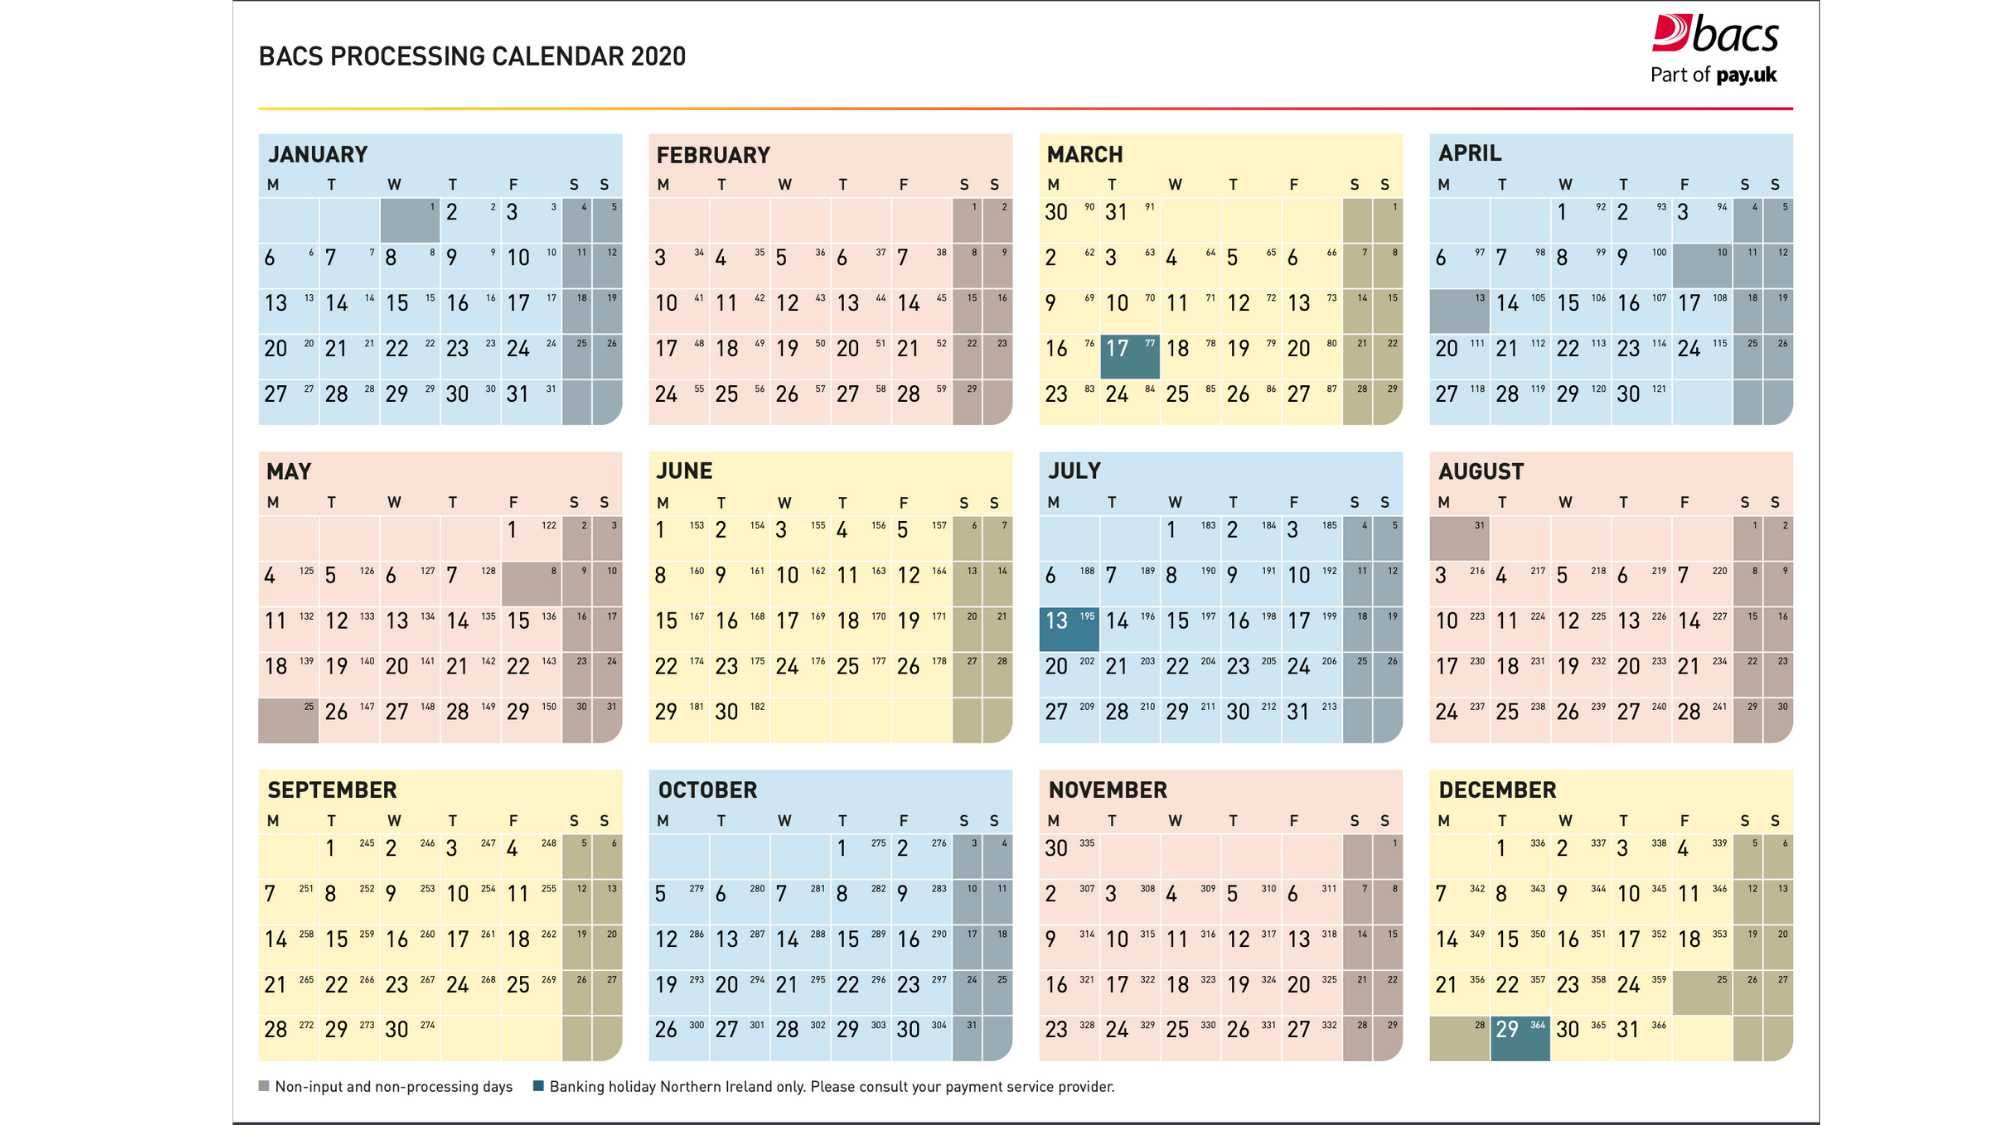 Bacs processing calendar 2020 | GoCardless